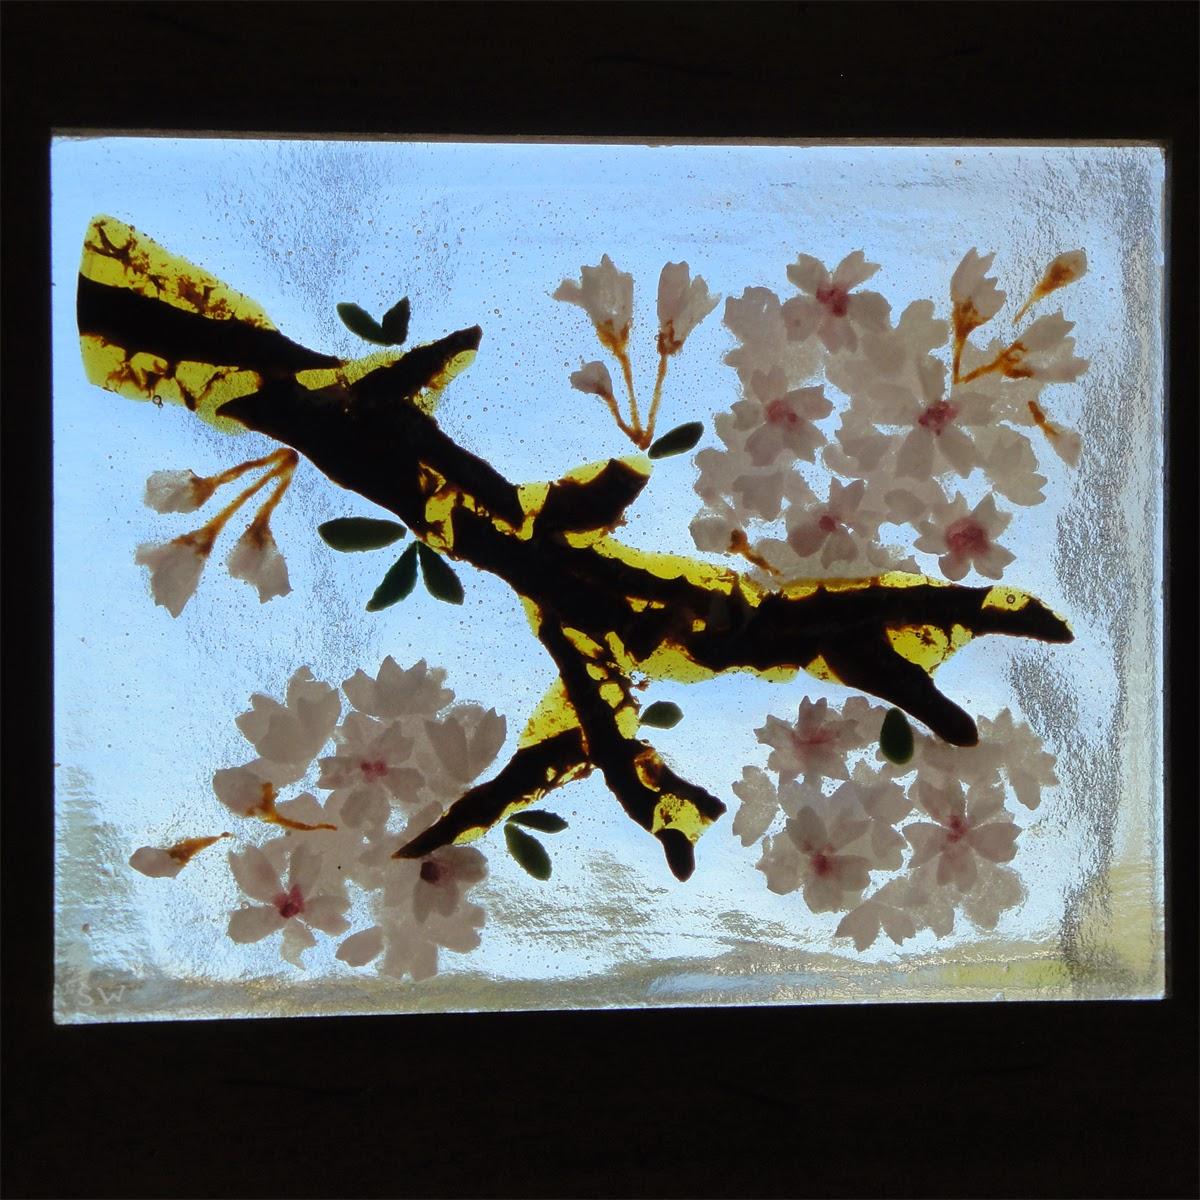 fused stained glass sakura cherry blossom flower flowers petals pink blooms on window flutterbyfoto flutterbybutterfly